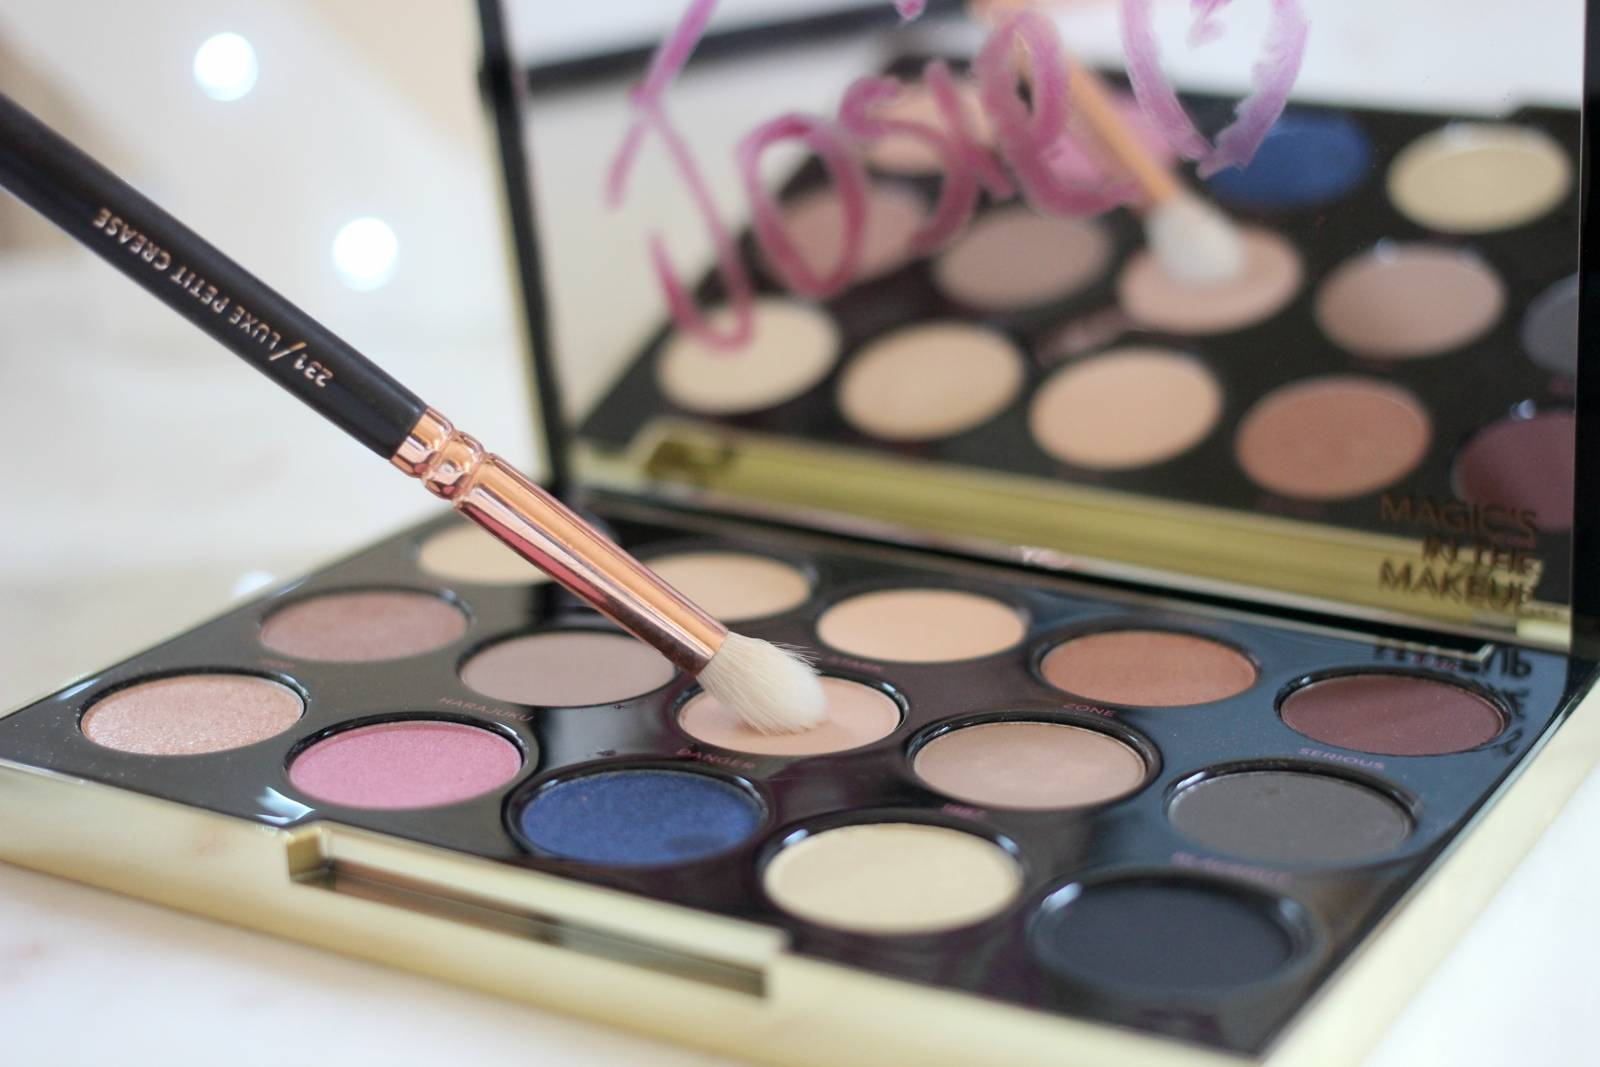 Impulse Charli XCX Rock & Love Inspired Beauty Routine 6